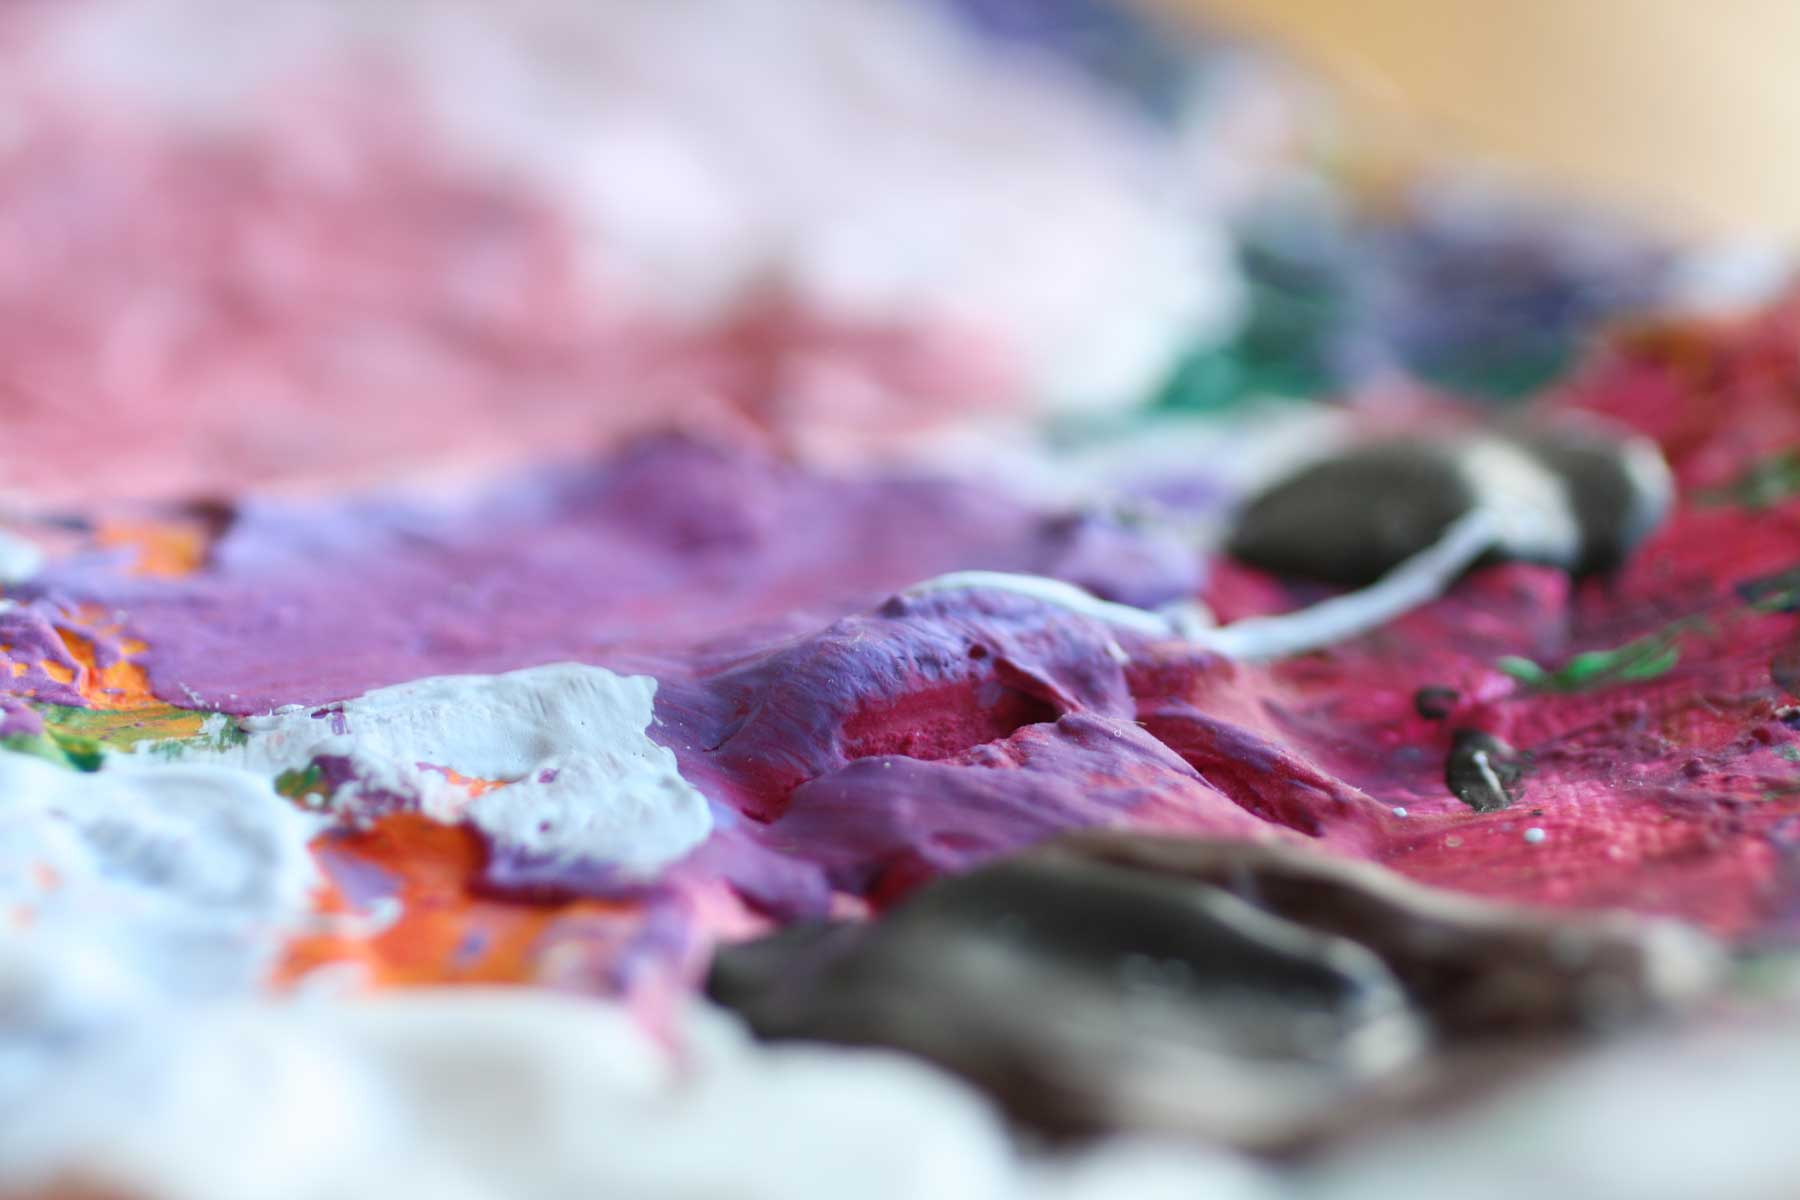 KunstimKreaitvzimmer - Birgit Fabian - Hintergrundbild Farbe